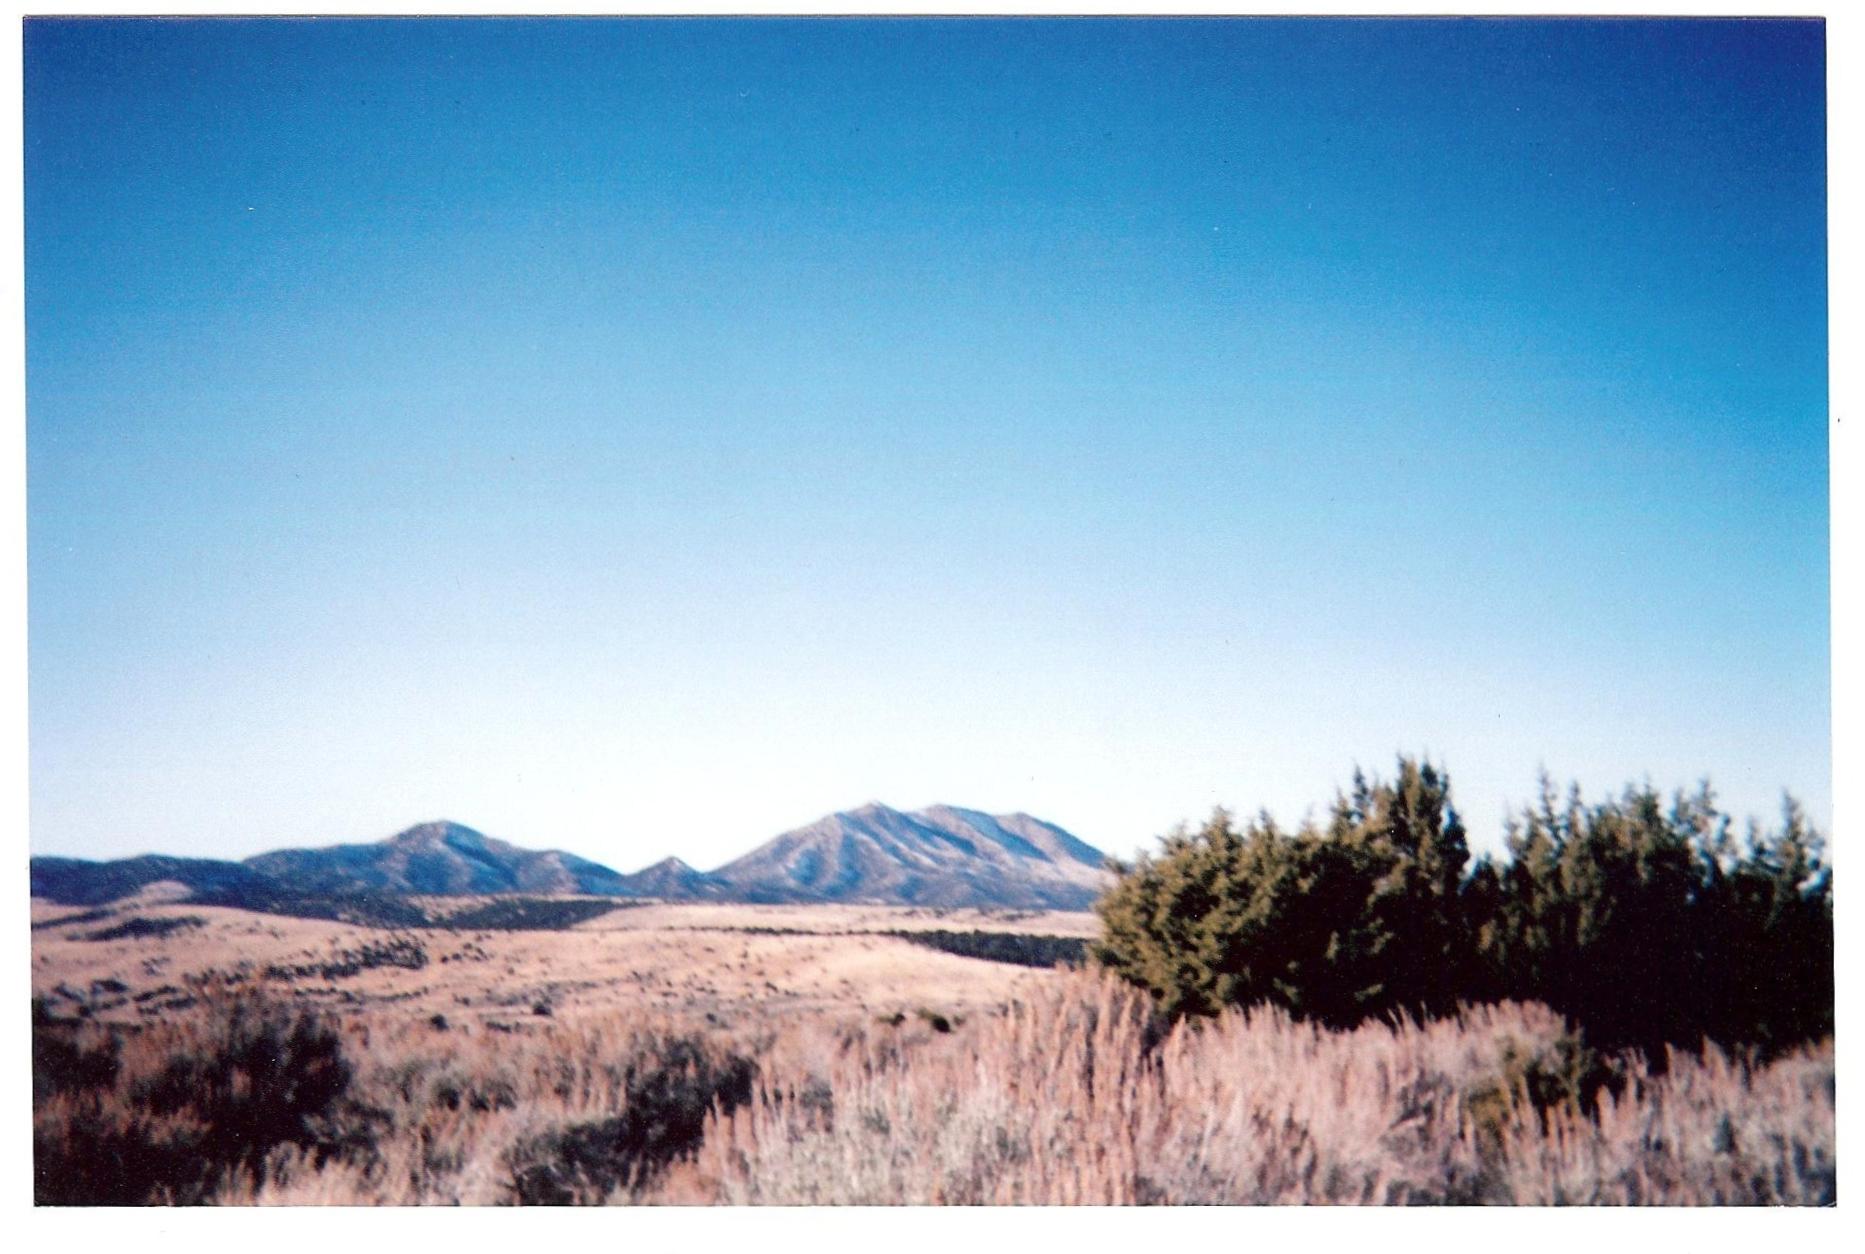 Wilderness 2012 002.jpg